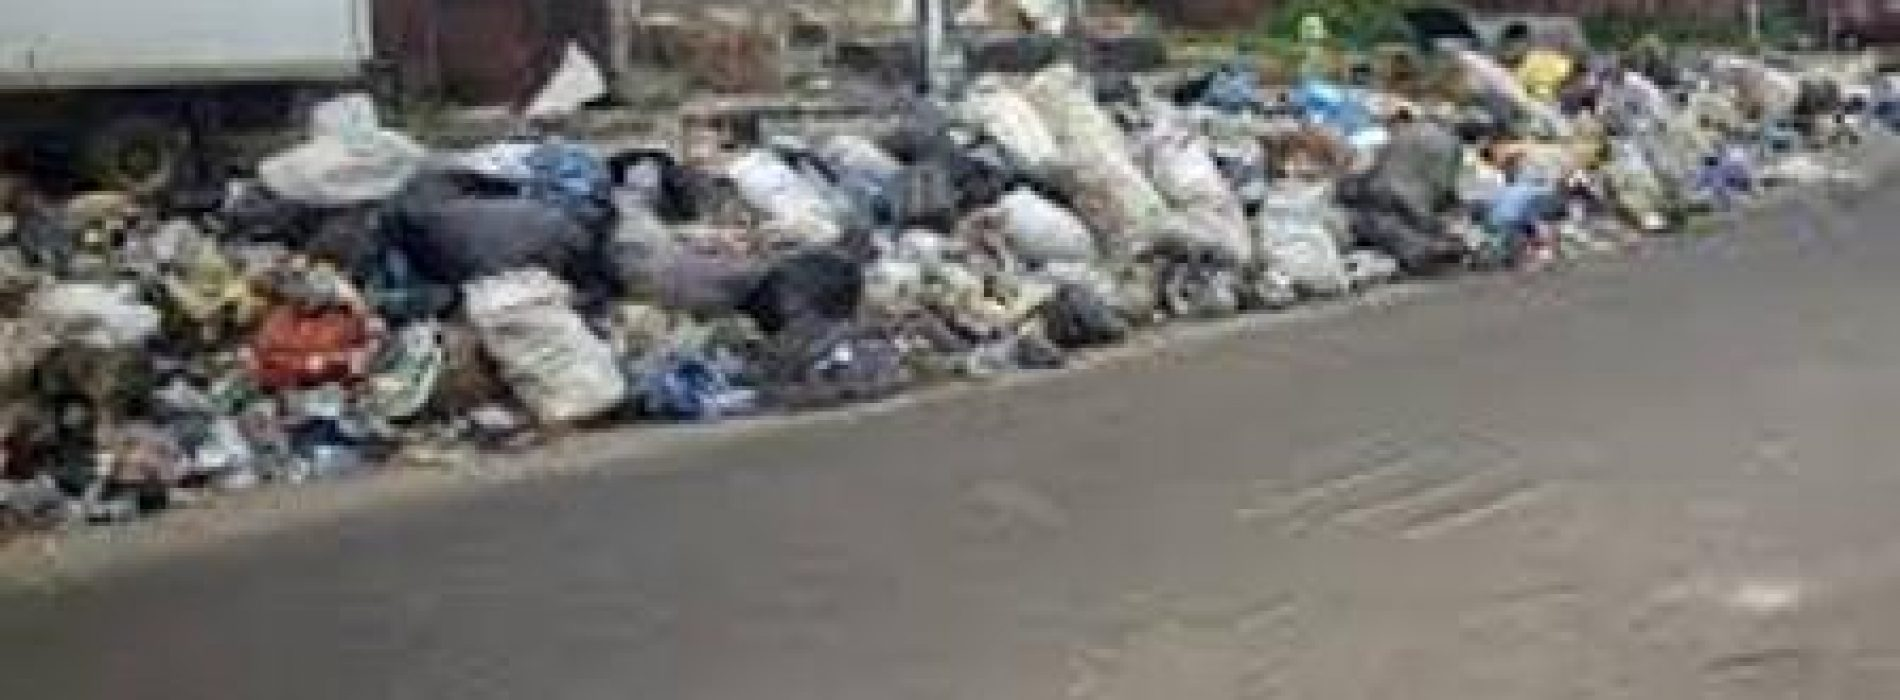 Refuse dumps take over Lagos